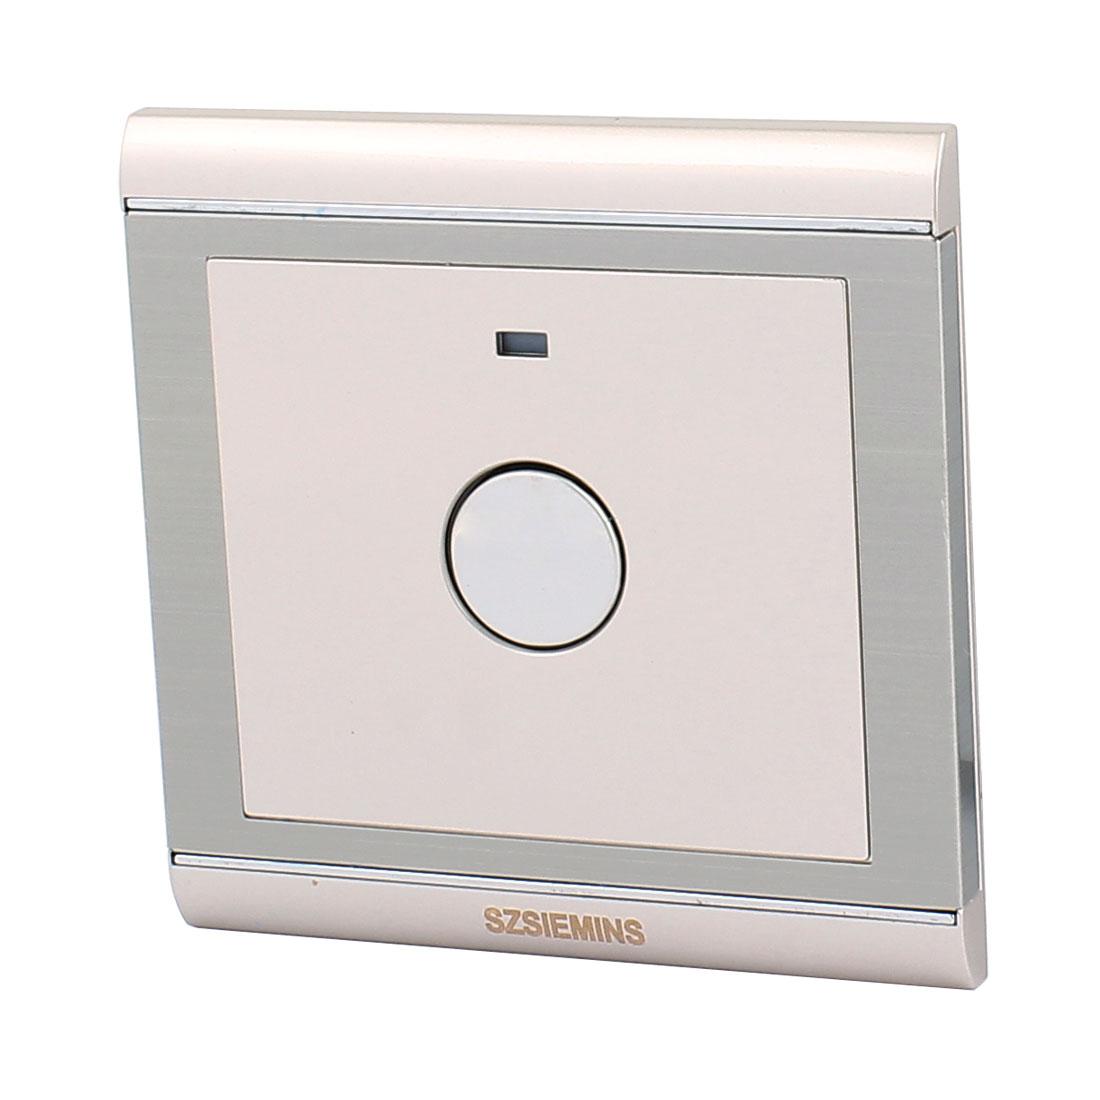 AC 160V-250V Noctilucent Indicator Light 86 Type Touch Sensor Switch Champagne Gold For Corridor